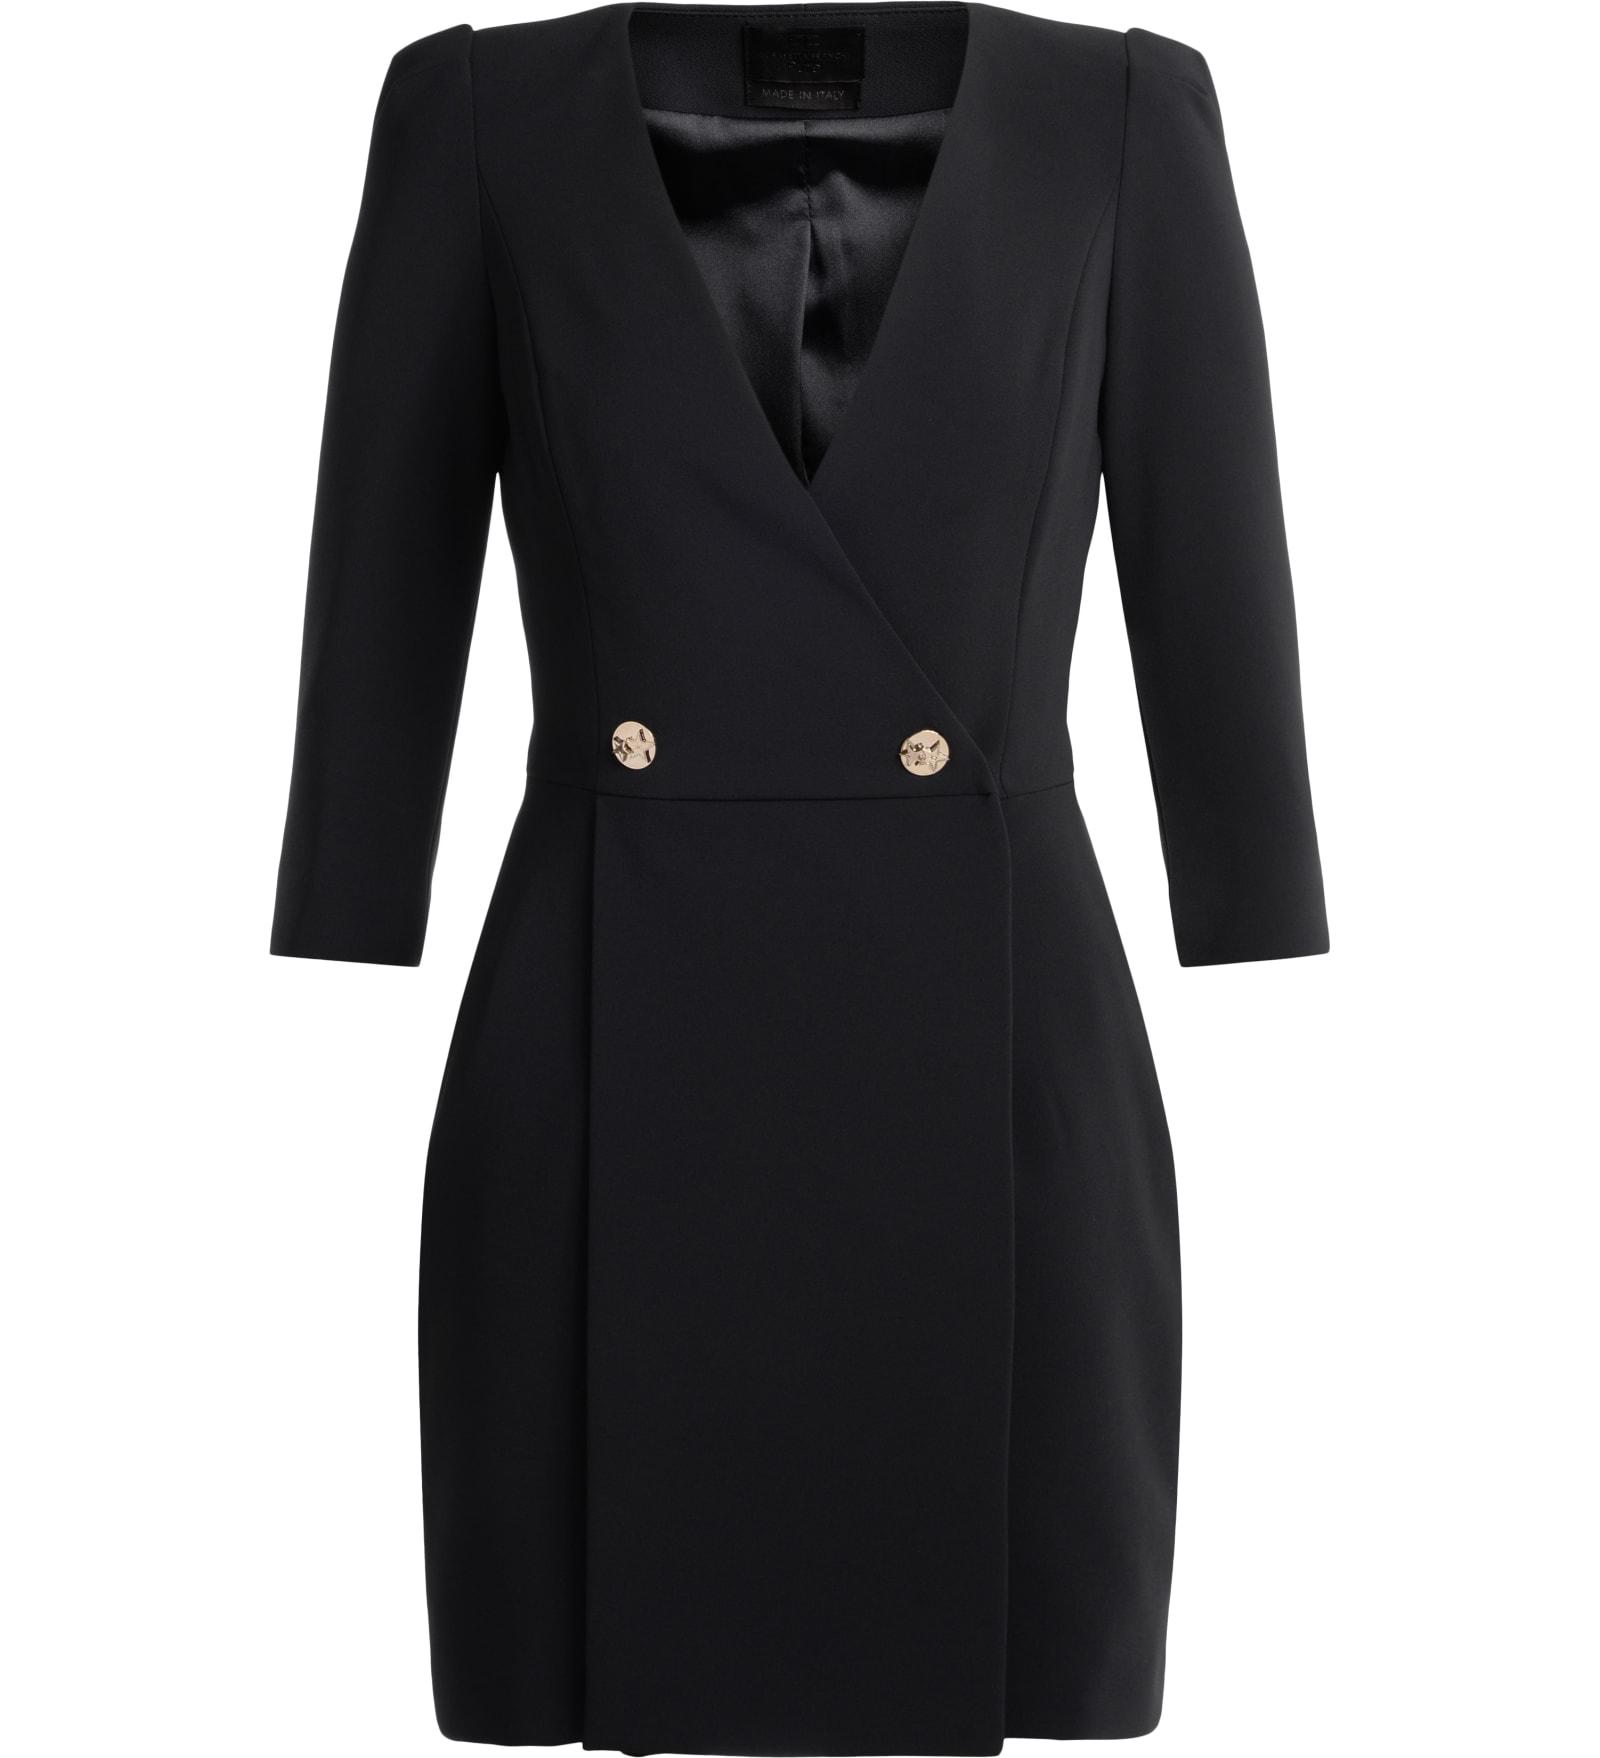 Elisabetta Franchi Black Wallet Dress With Three-quarter Sleeves